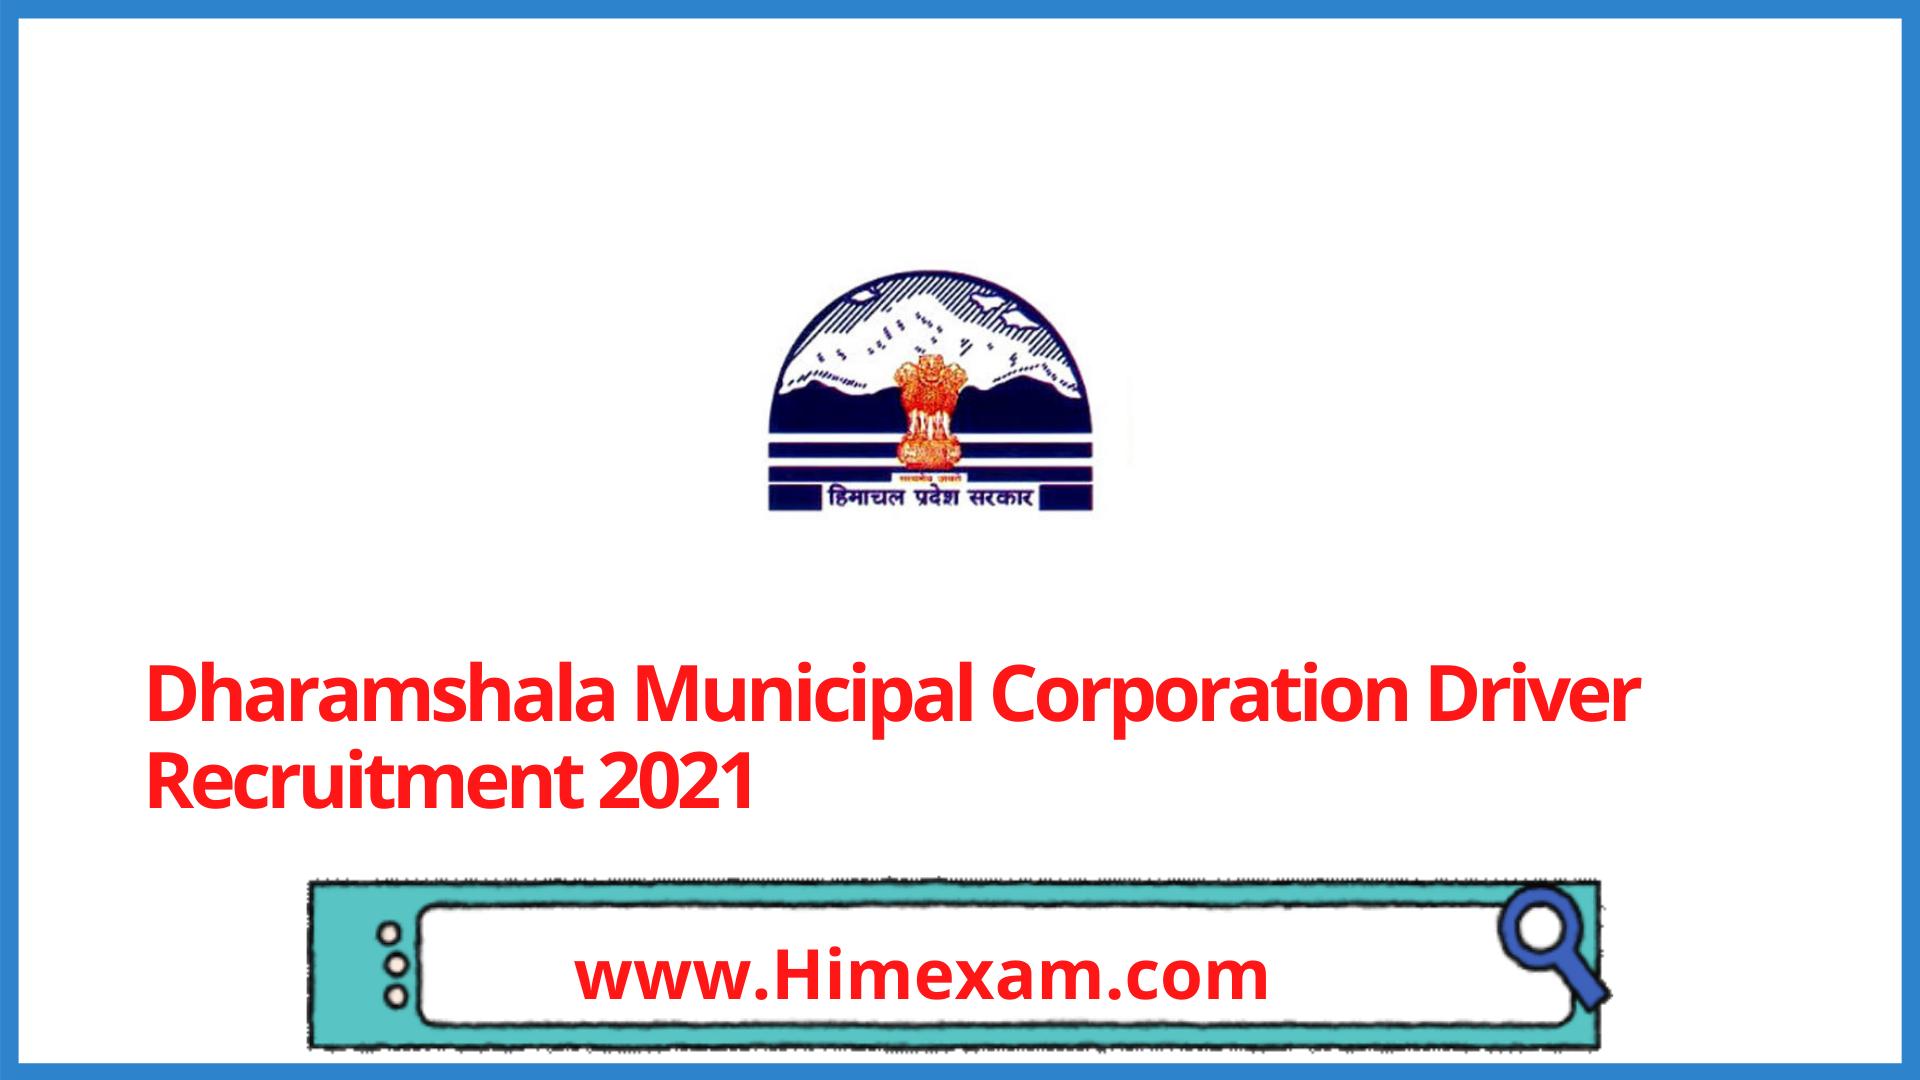 Dharamshala Municipal Corporation Driver Recruitment 2021